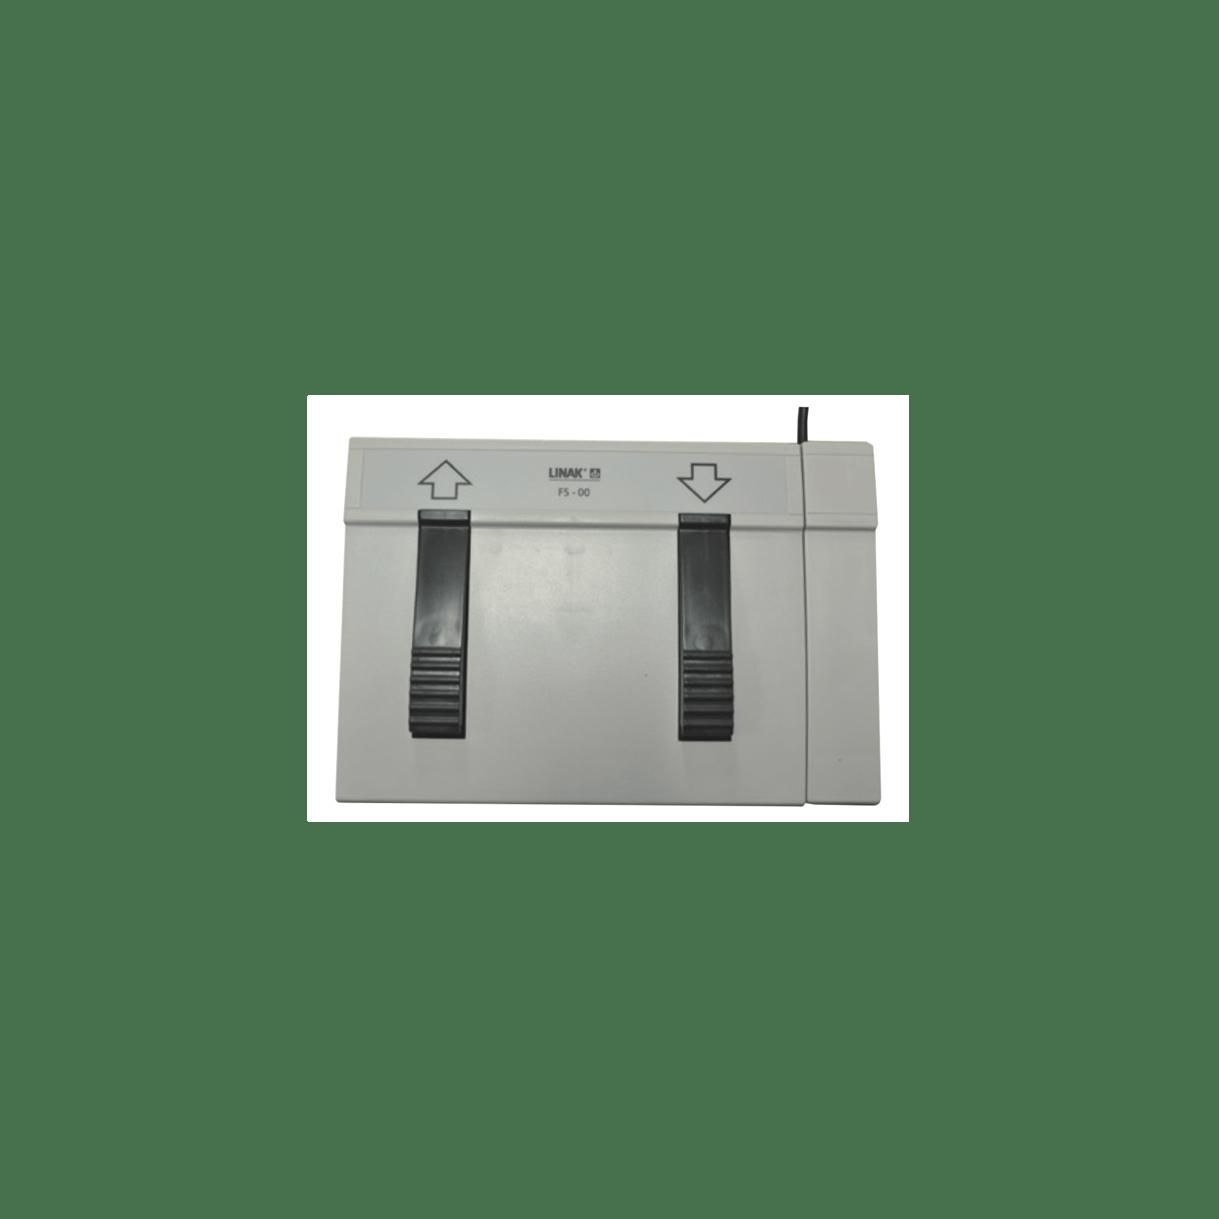 footswitch linak